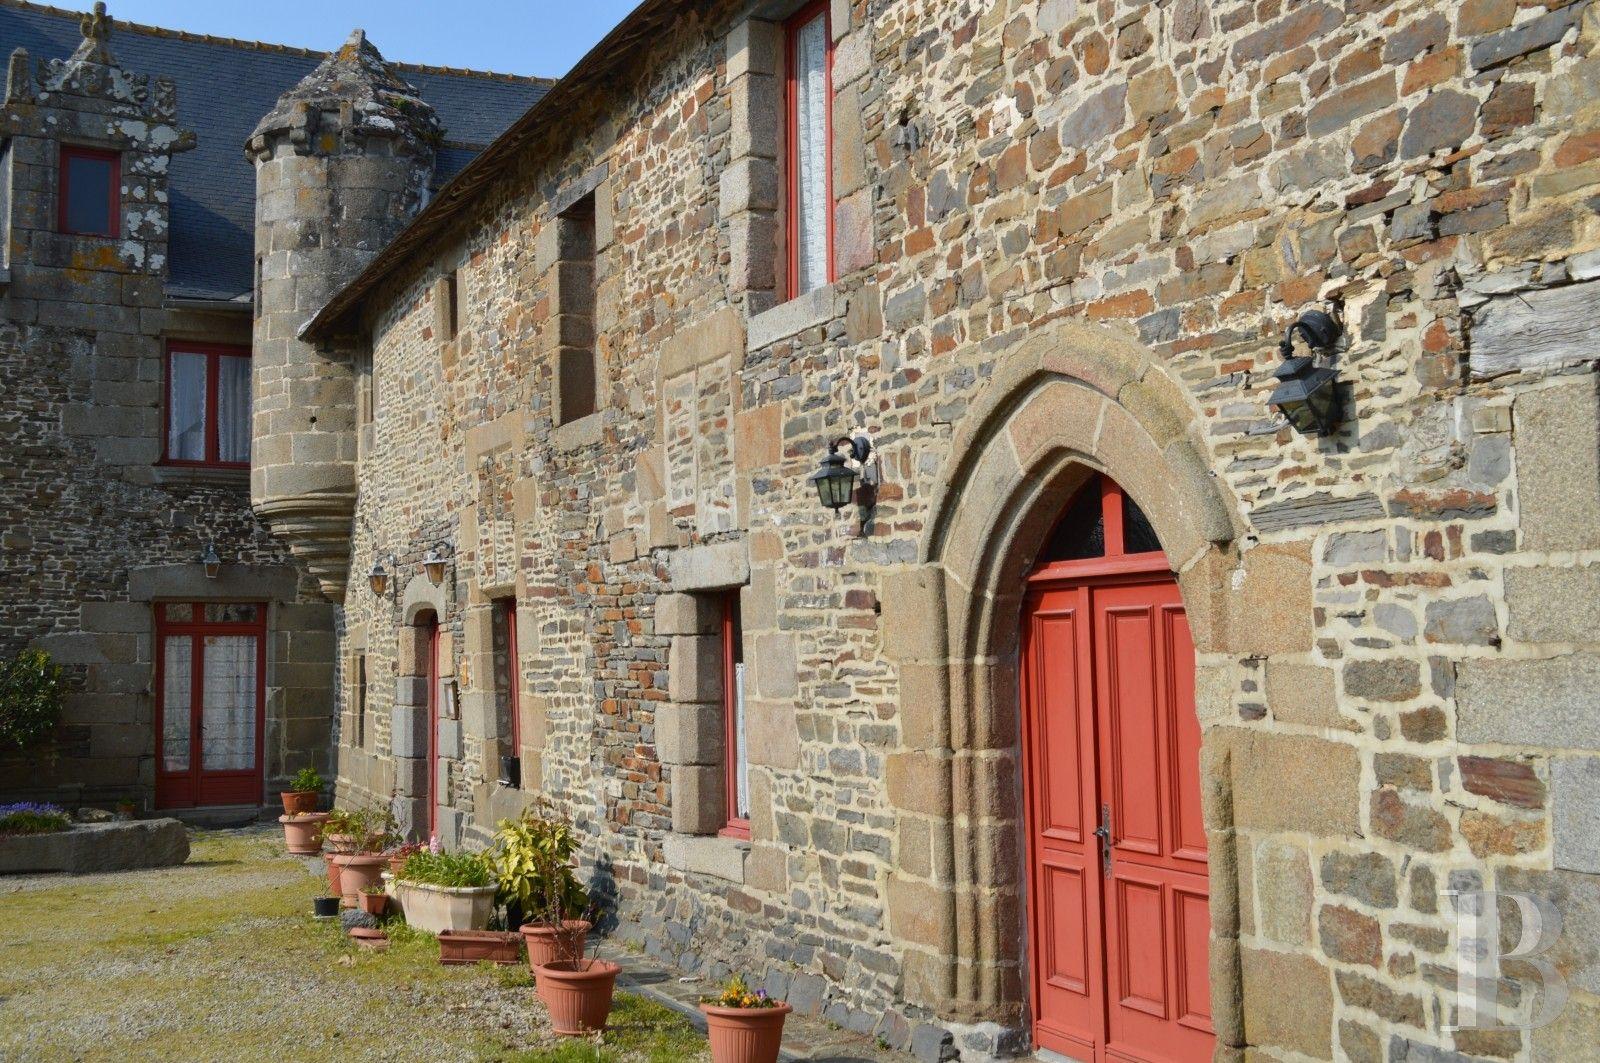 16th Century French Home - eedff395149ac09fe9e1576272775c0a_Beautiful 16th Century French Home - eedff395149ac09fe9e1576272775c0a  Snapshot_433592.jpg